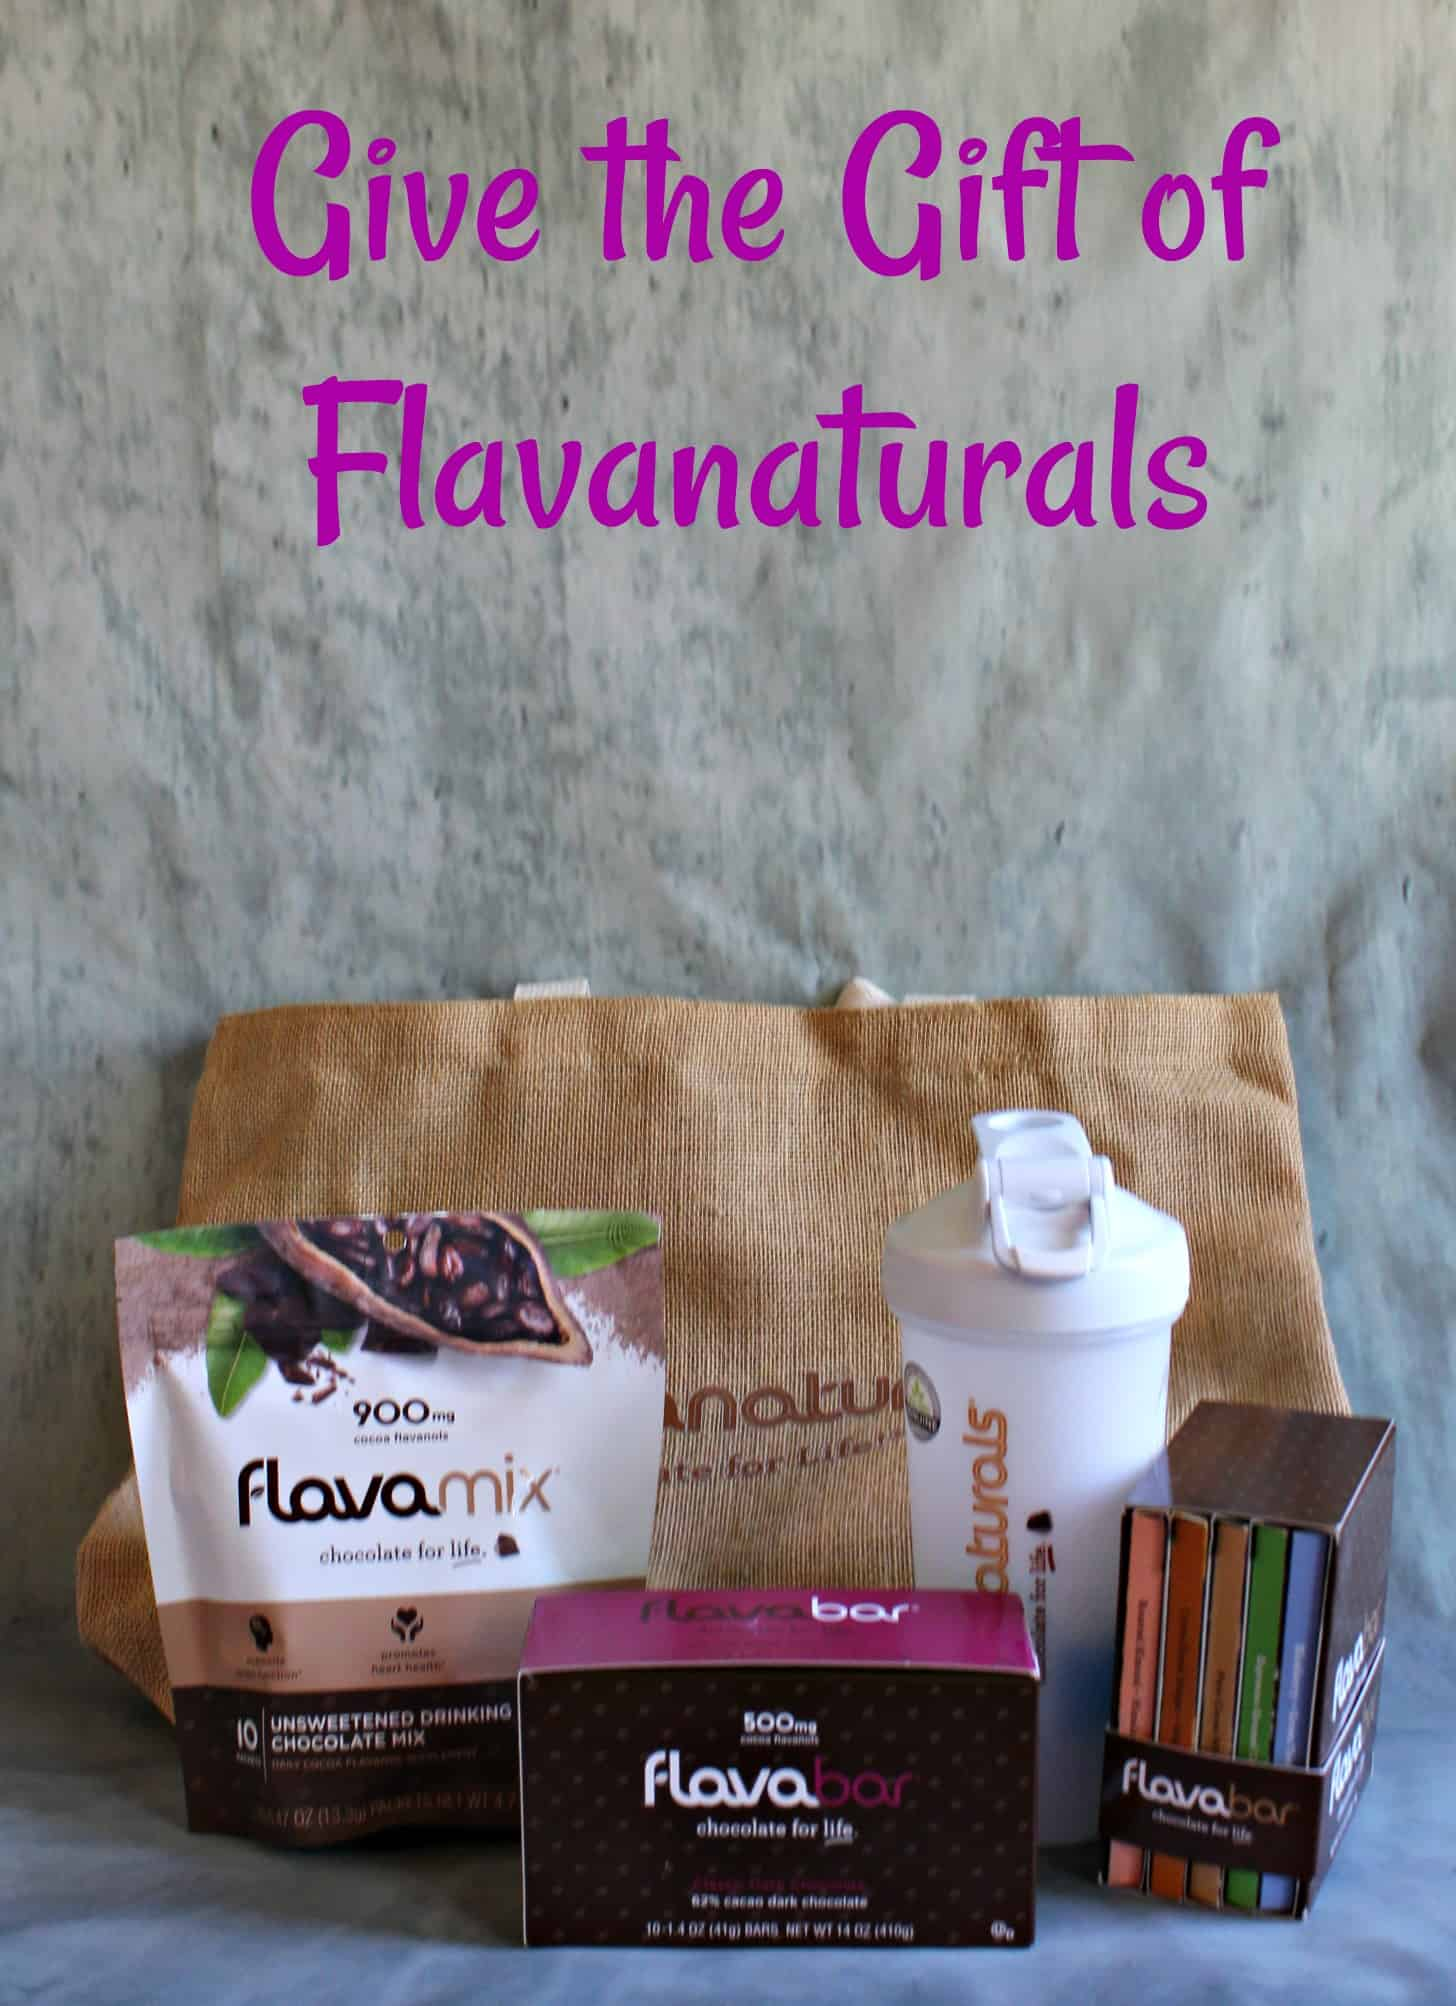 Flavanaturals